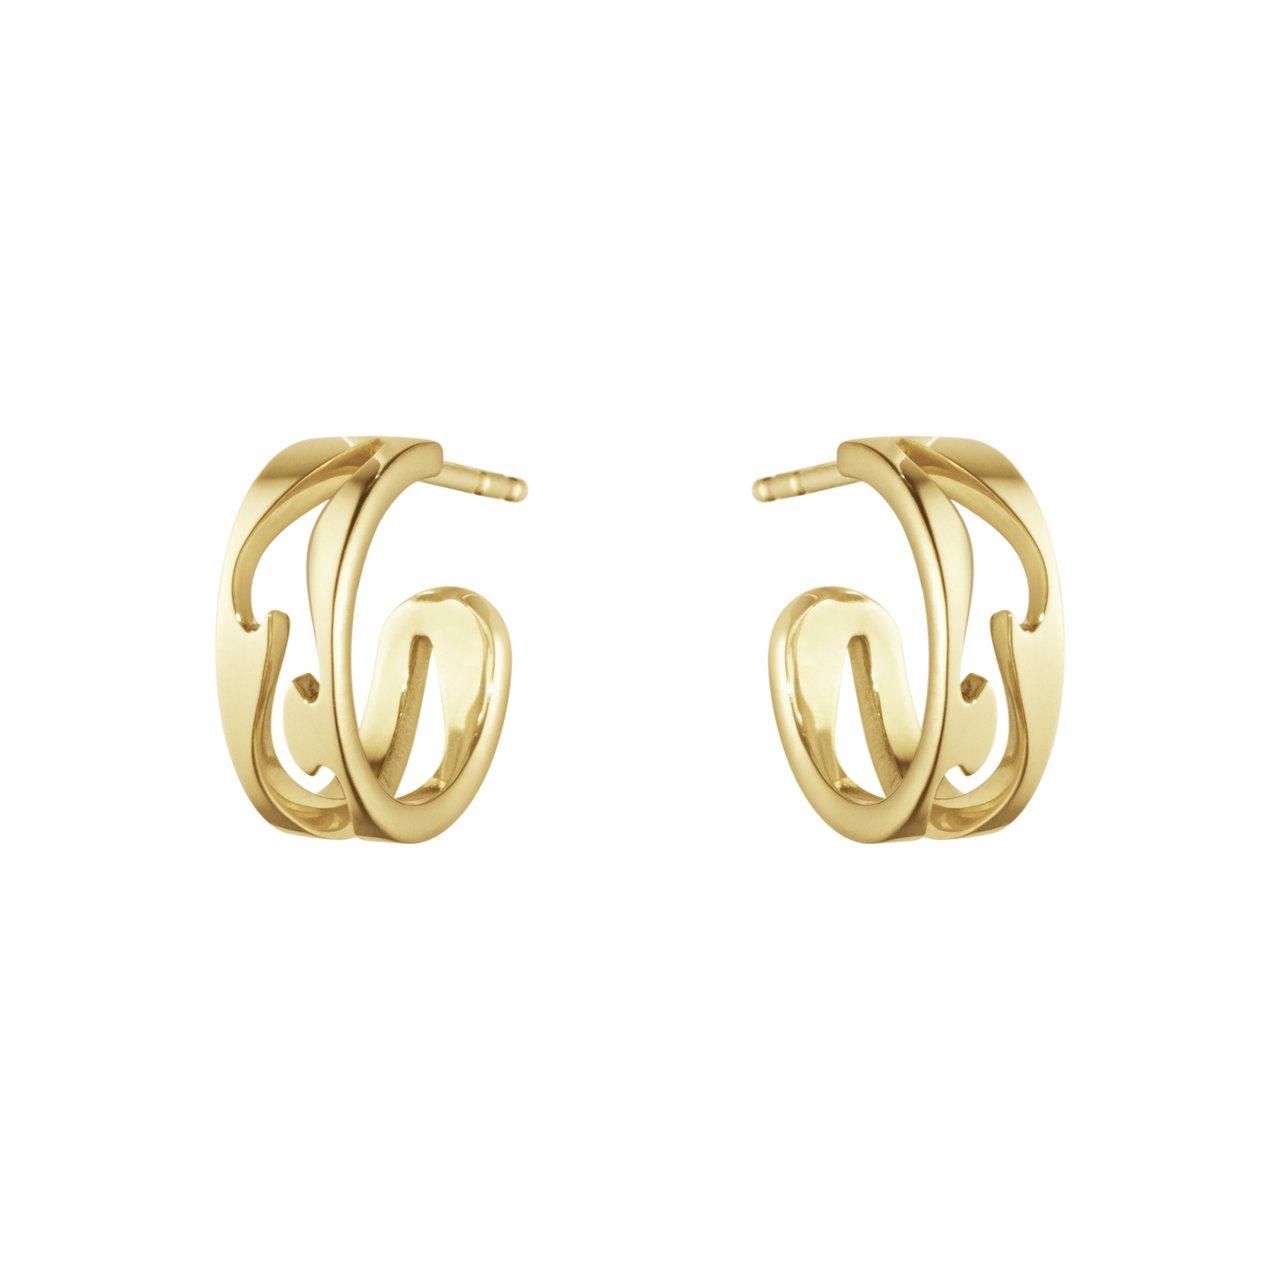 GEORG JENSEN NEW FUSION系列18K黃金鏤空耳環,35,50...